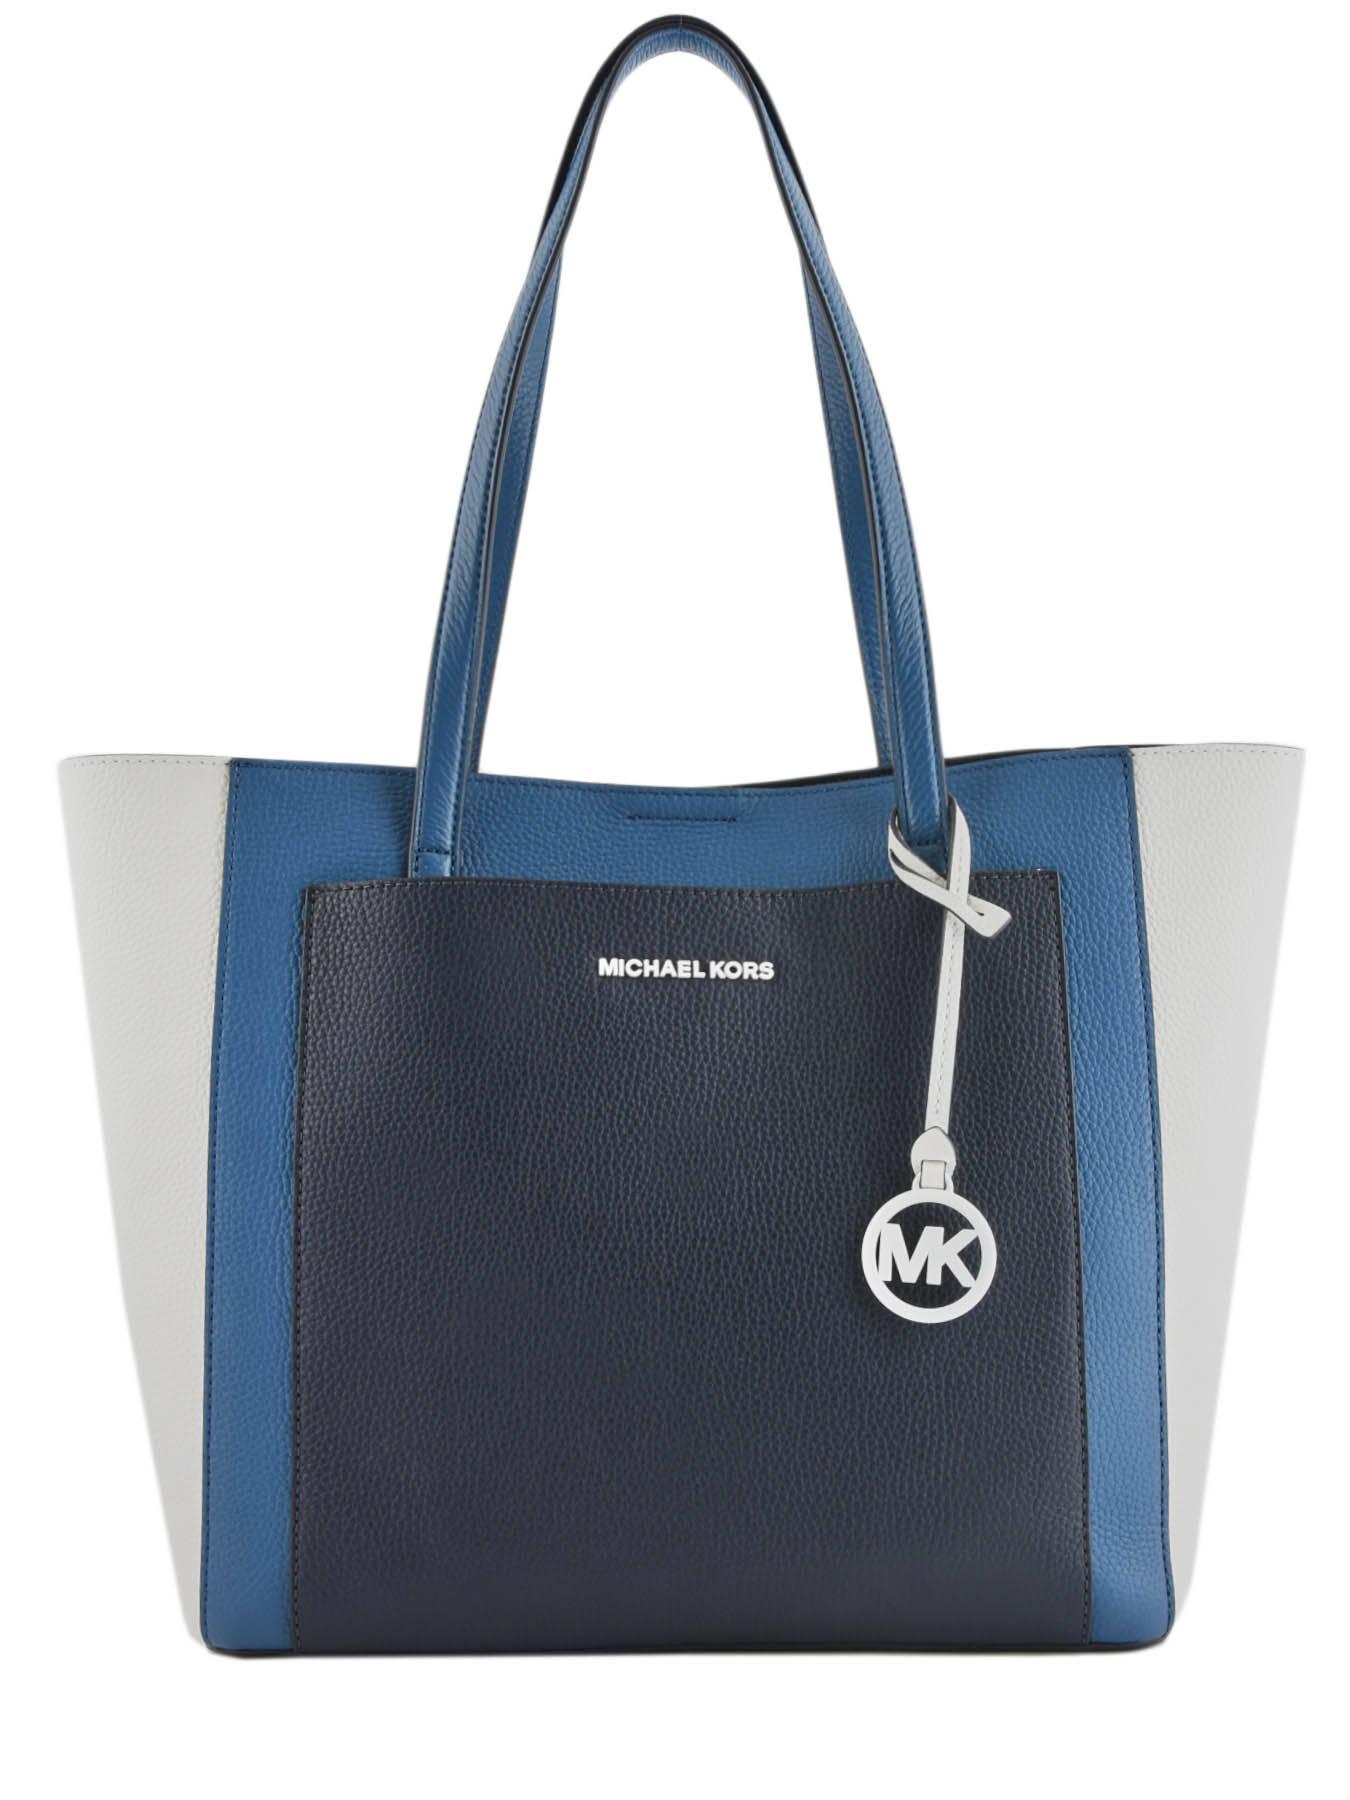 e908535d4c32 ... Anette Leather Tote Bag Michael kors Blue anette S9LGXT3T ...